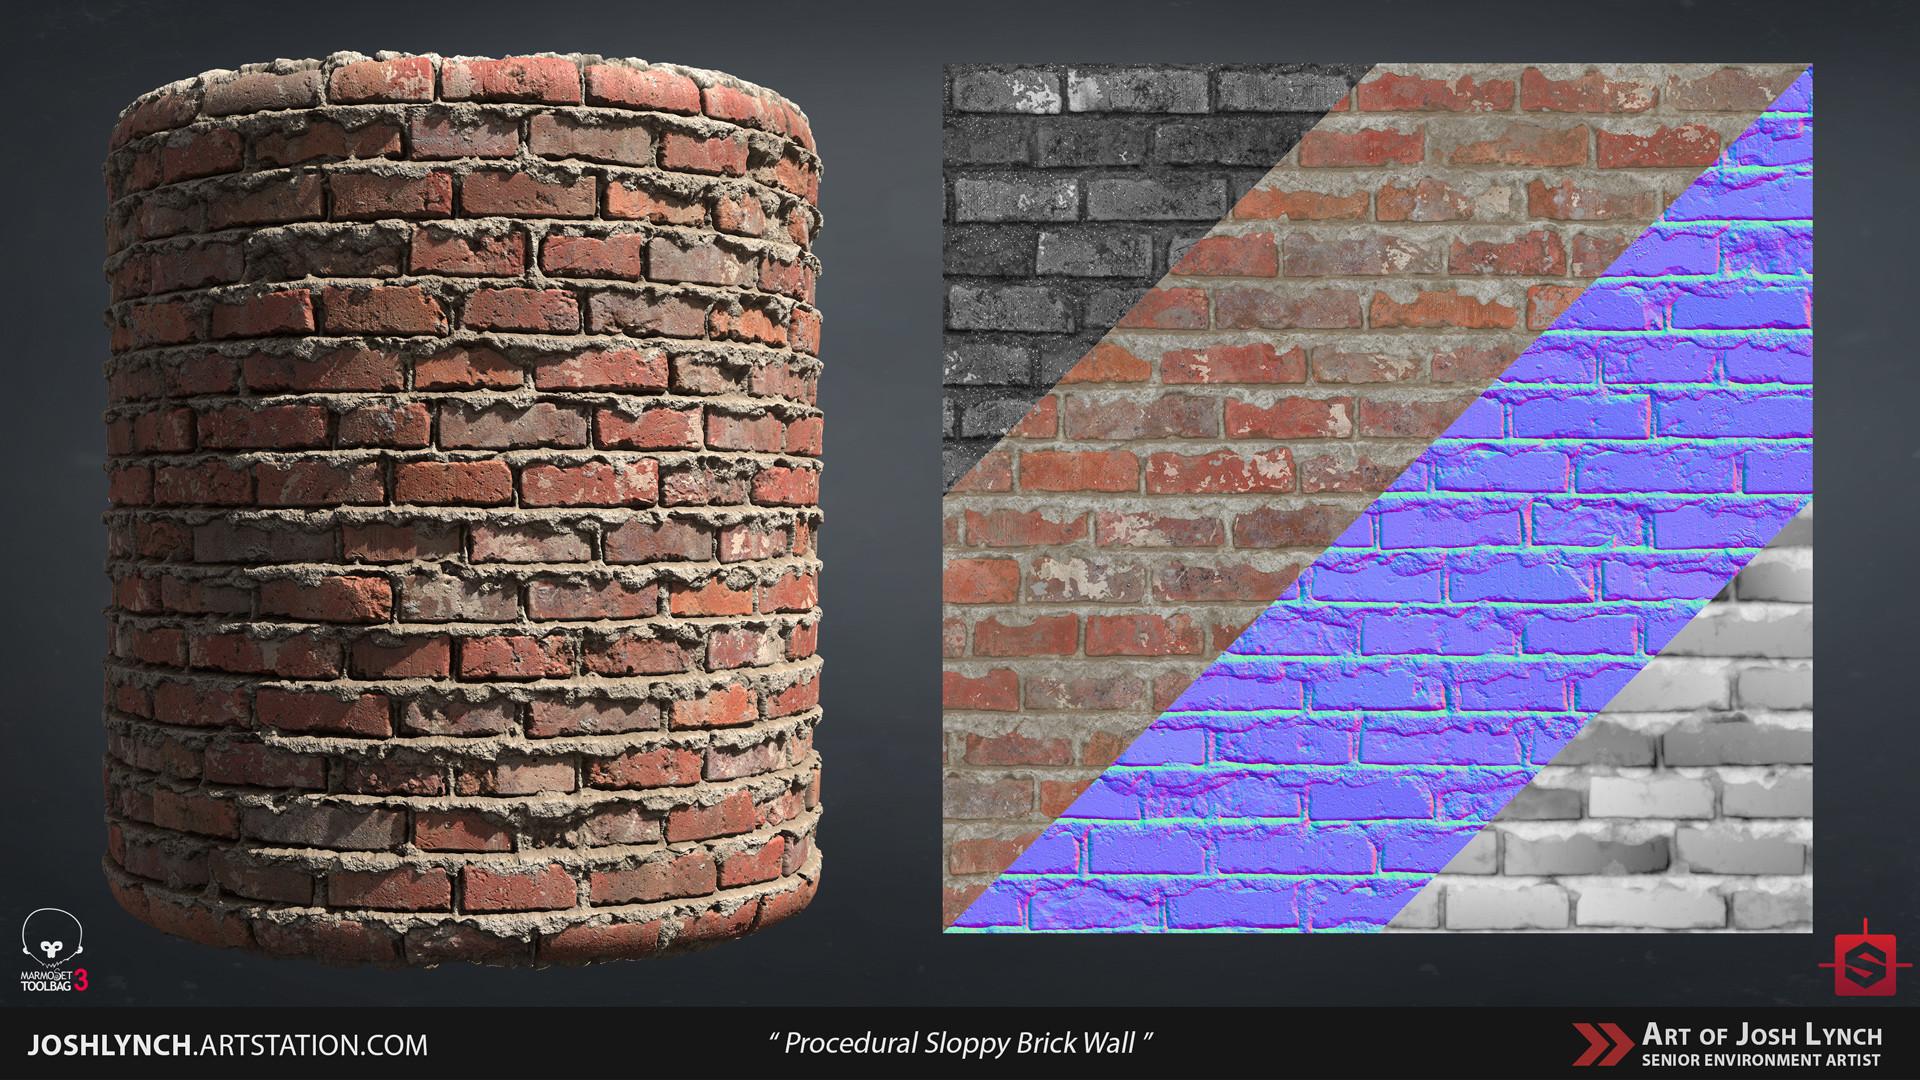 Joshua lynch wall brick sloppy 02 layout comp cylinder 02